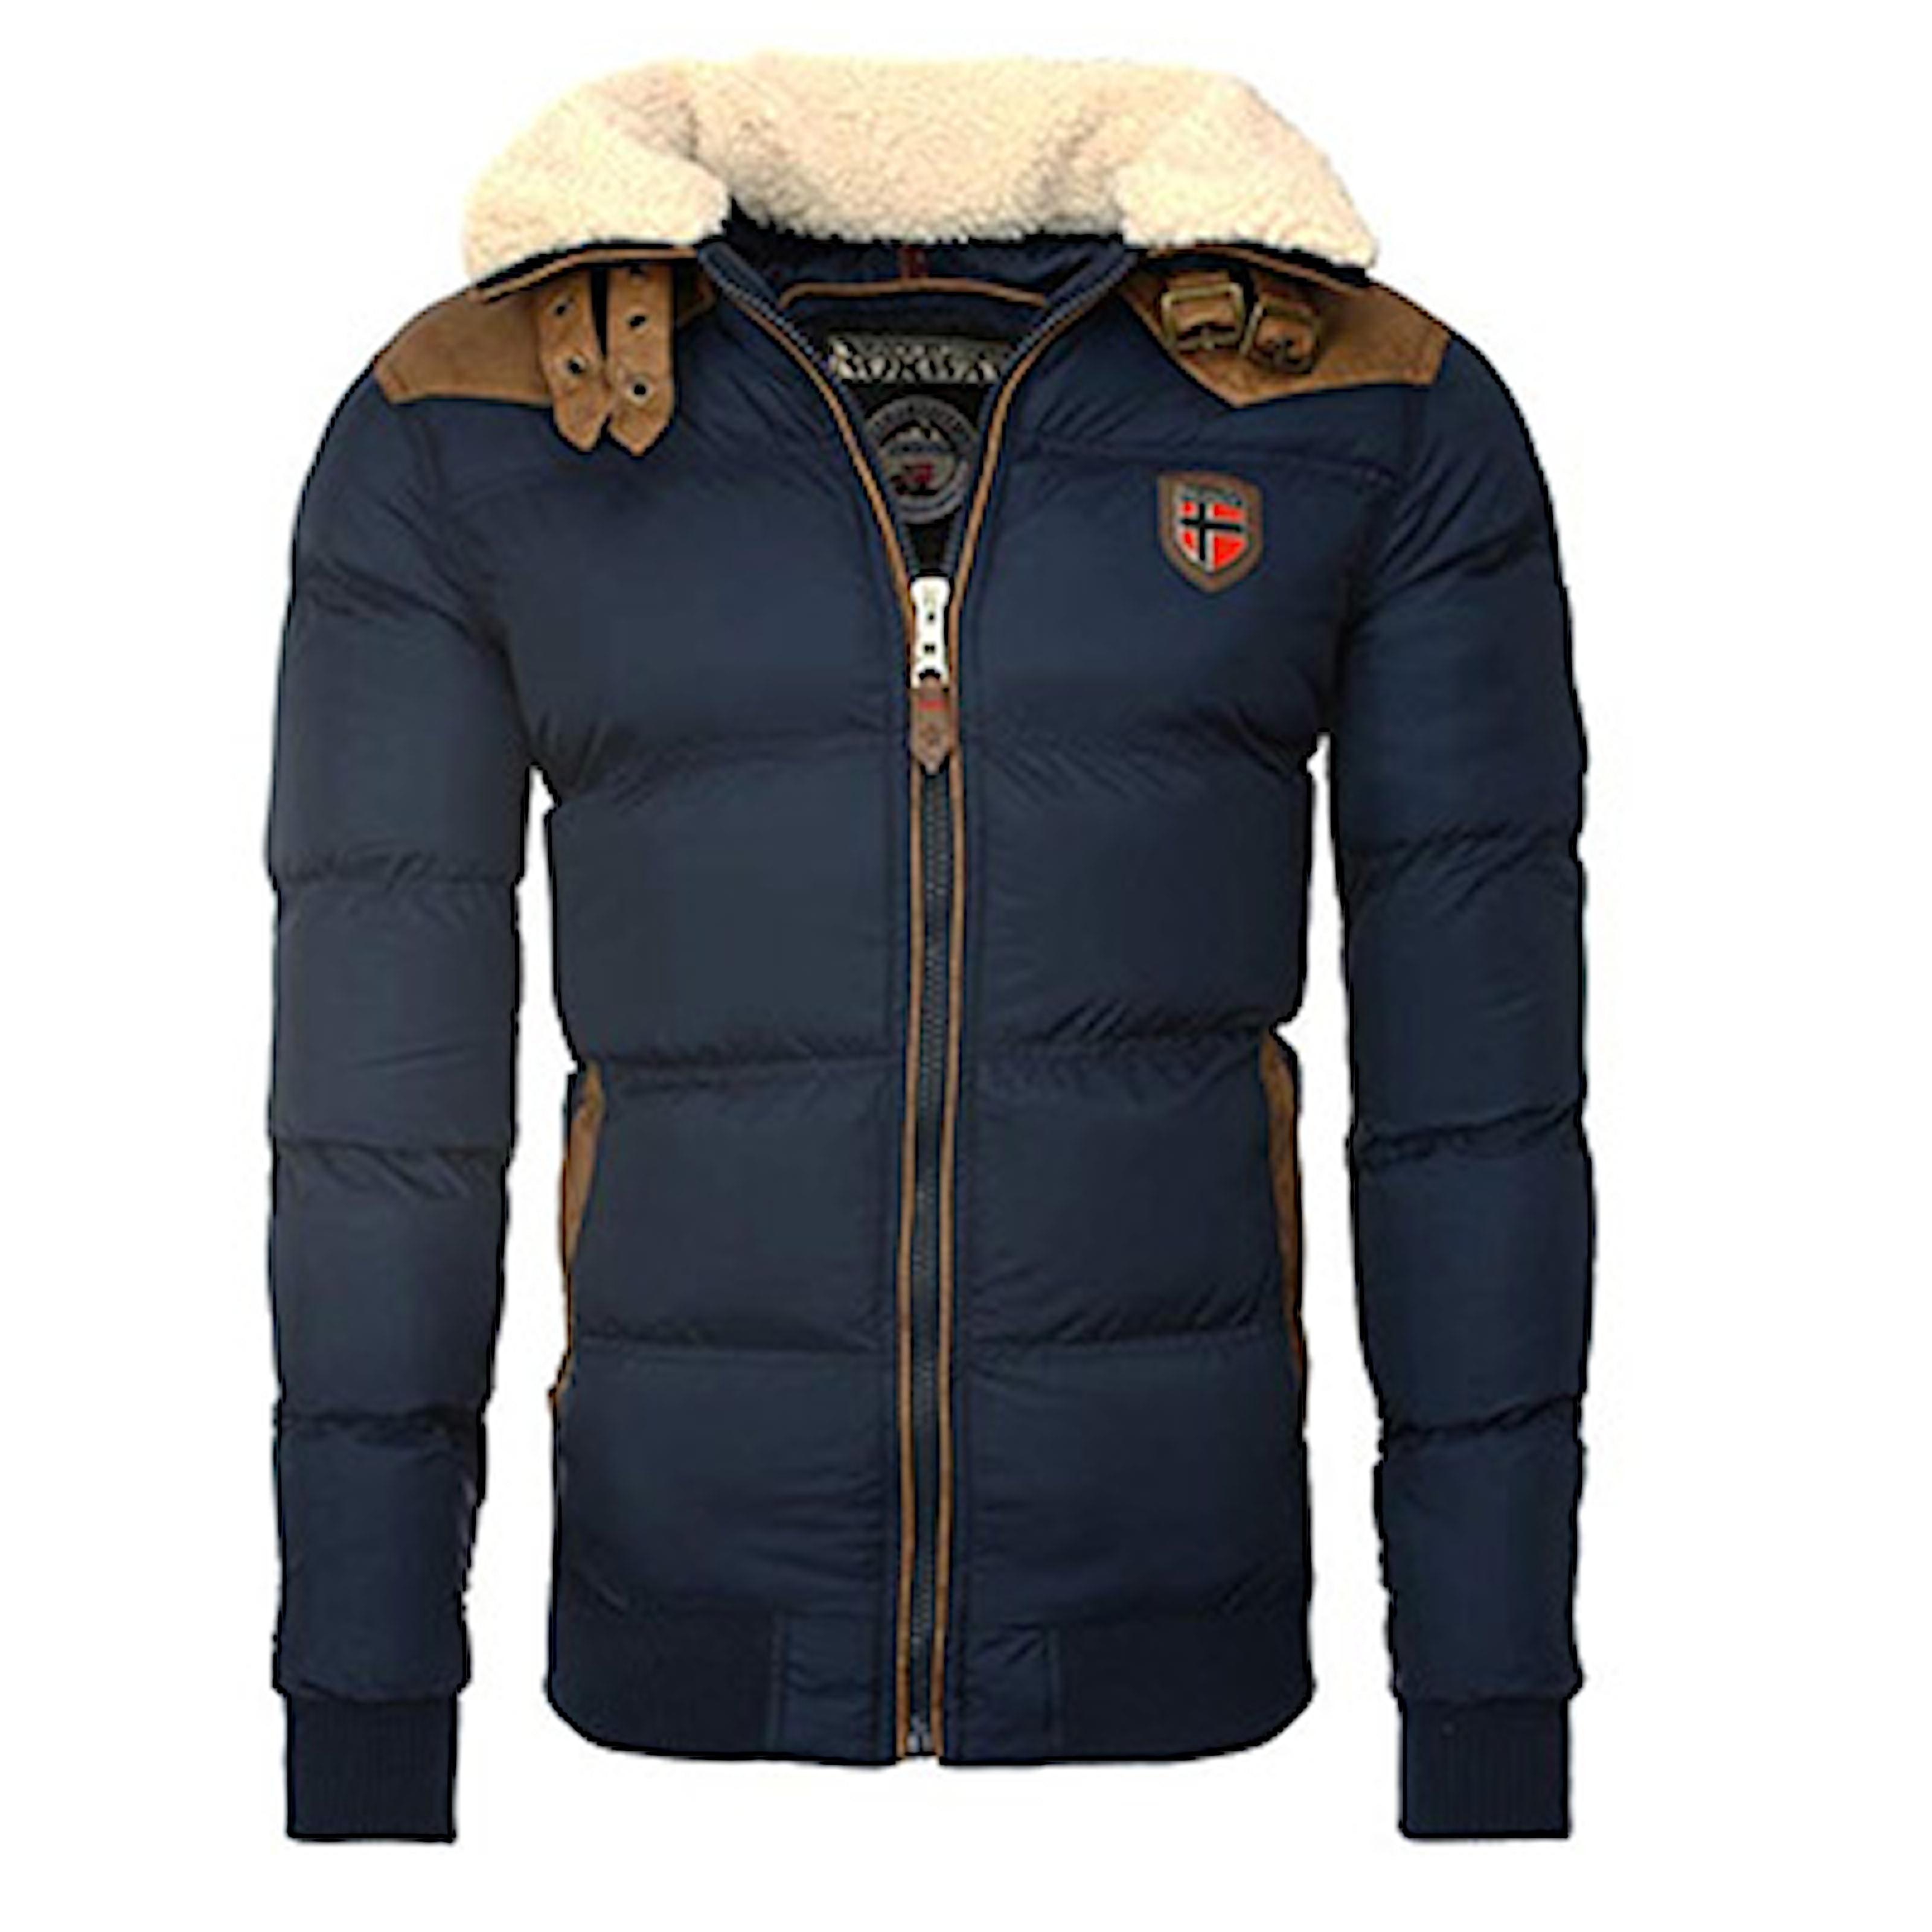 Marineblå, 3XL, Geographical Norway Padded Warm Jacket, Vinterjakke for menn, ,